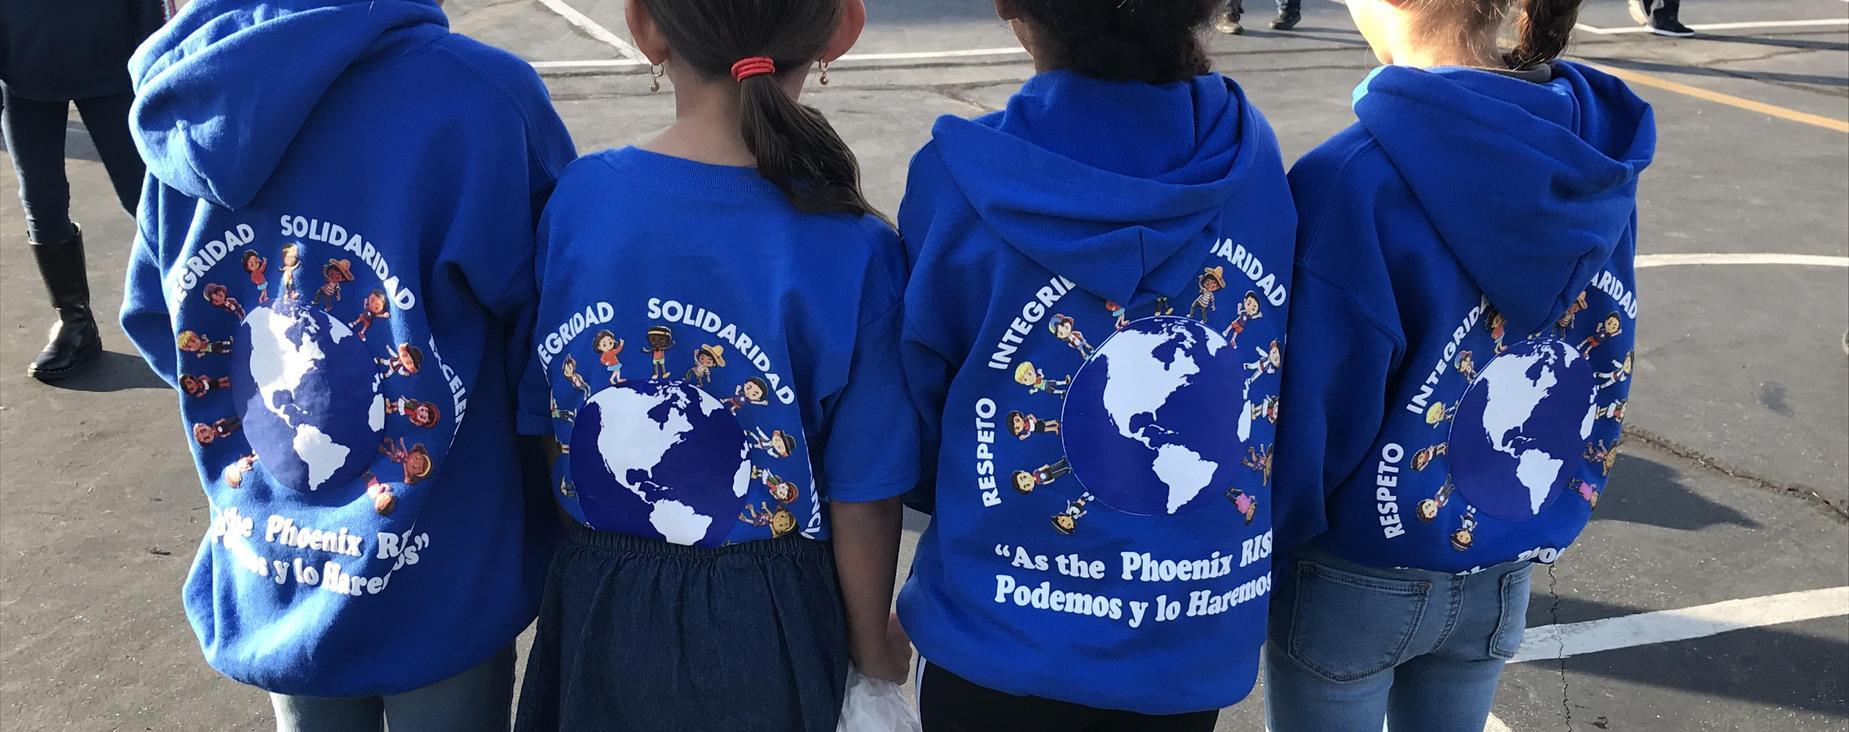 Students wearing EHWLA's spirit gear